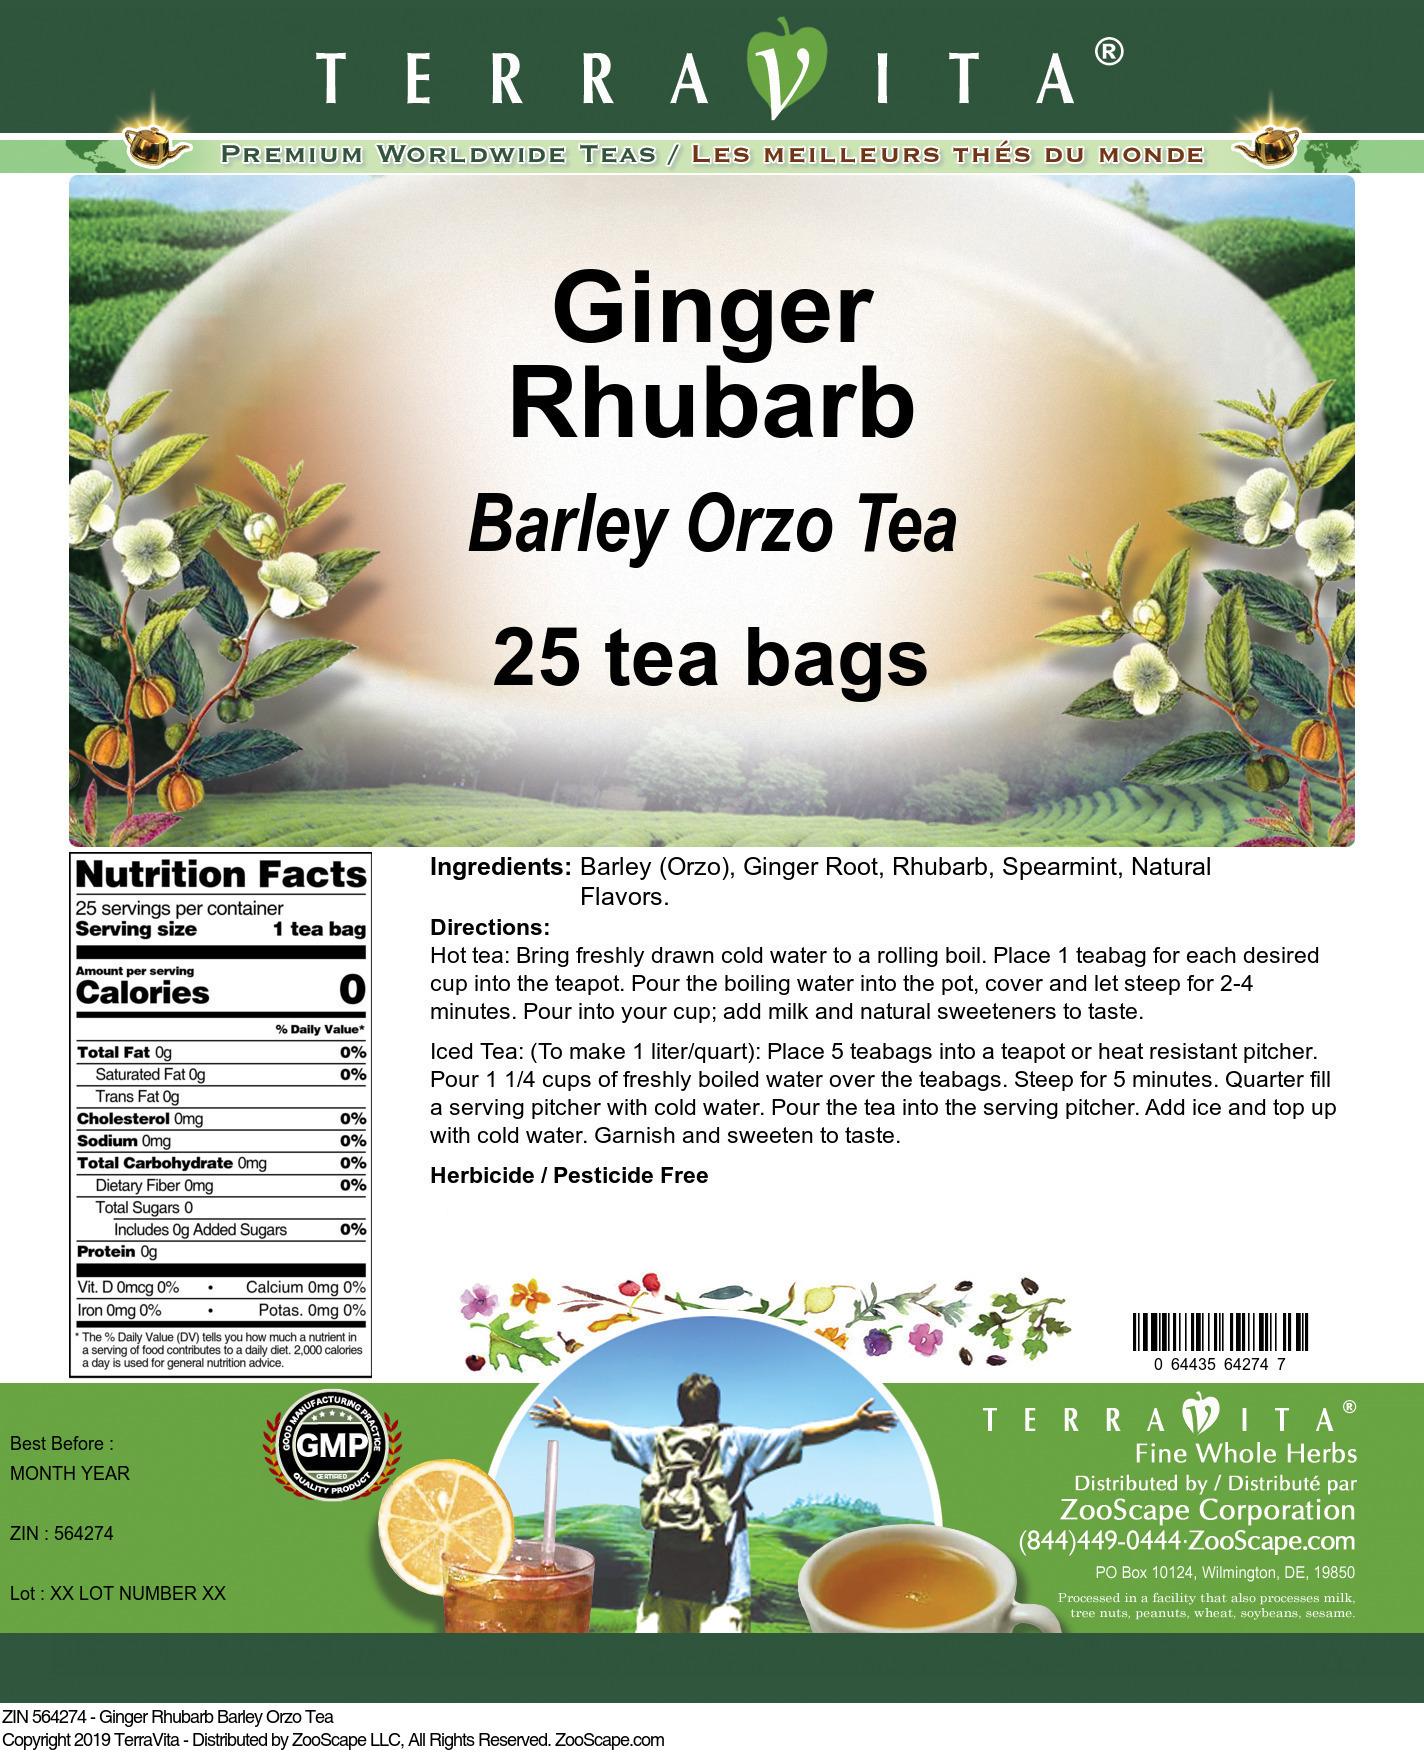 Ginger Rhubarb Barley Orzo Tea